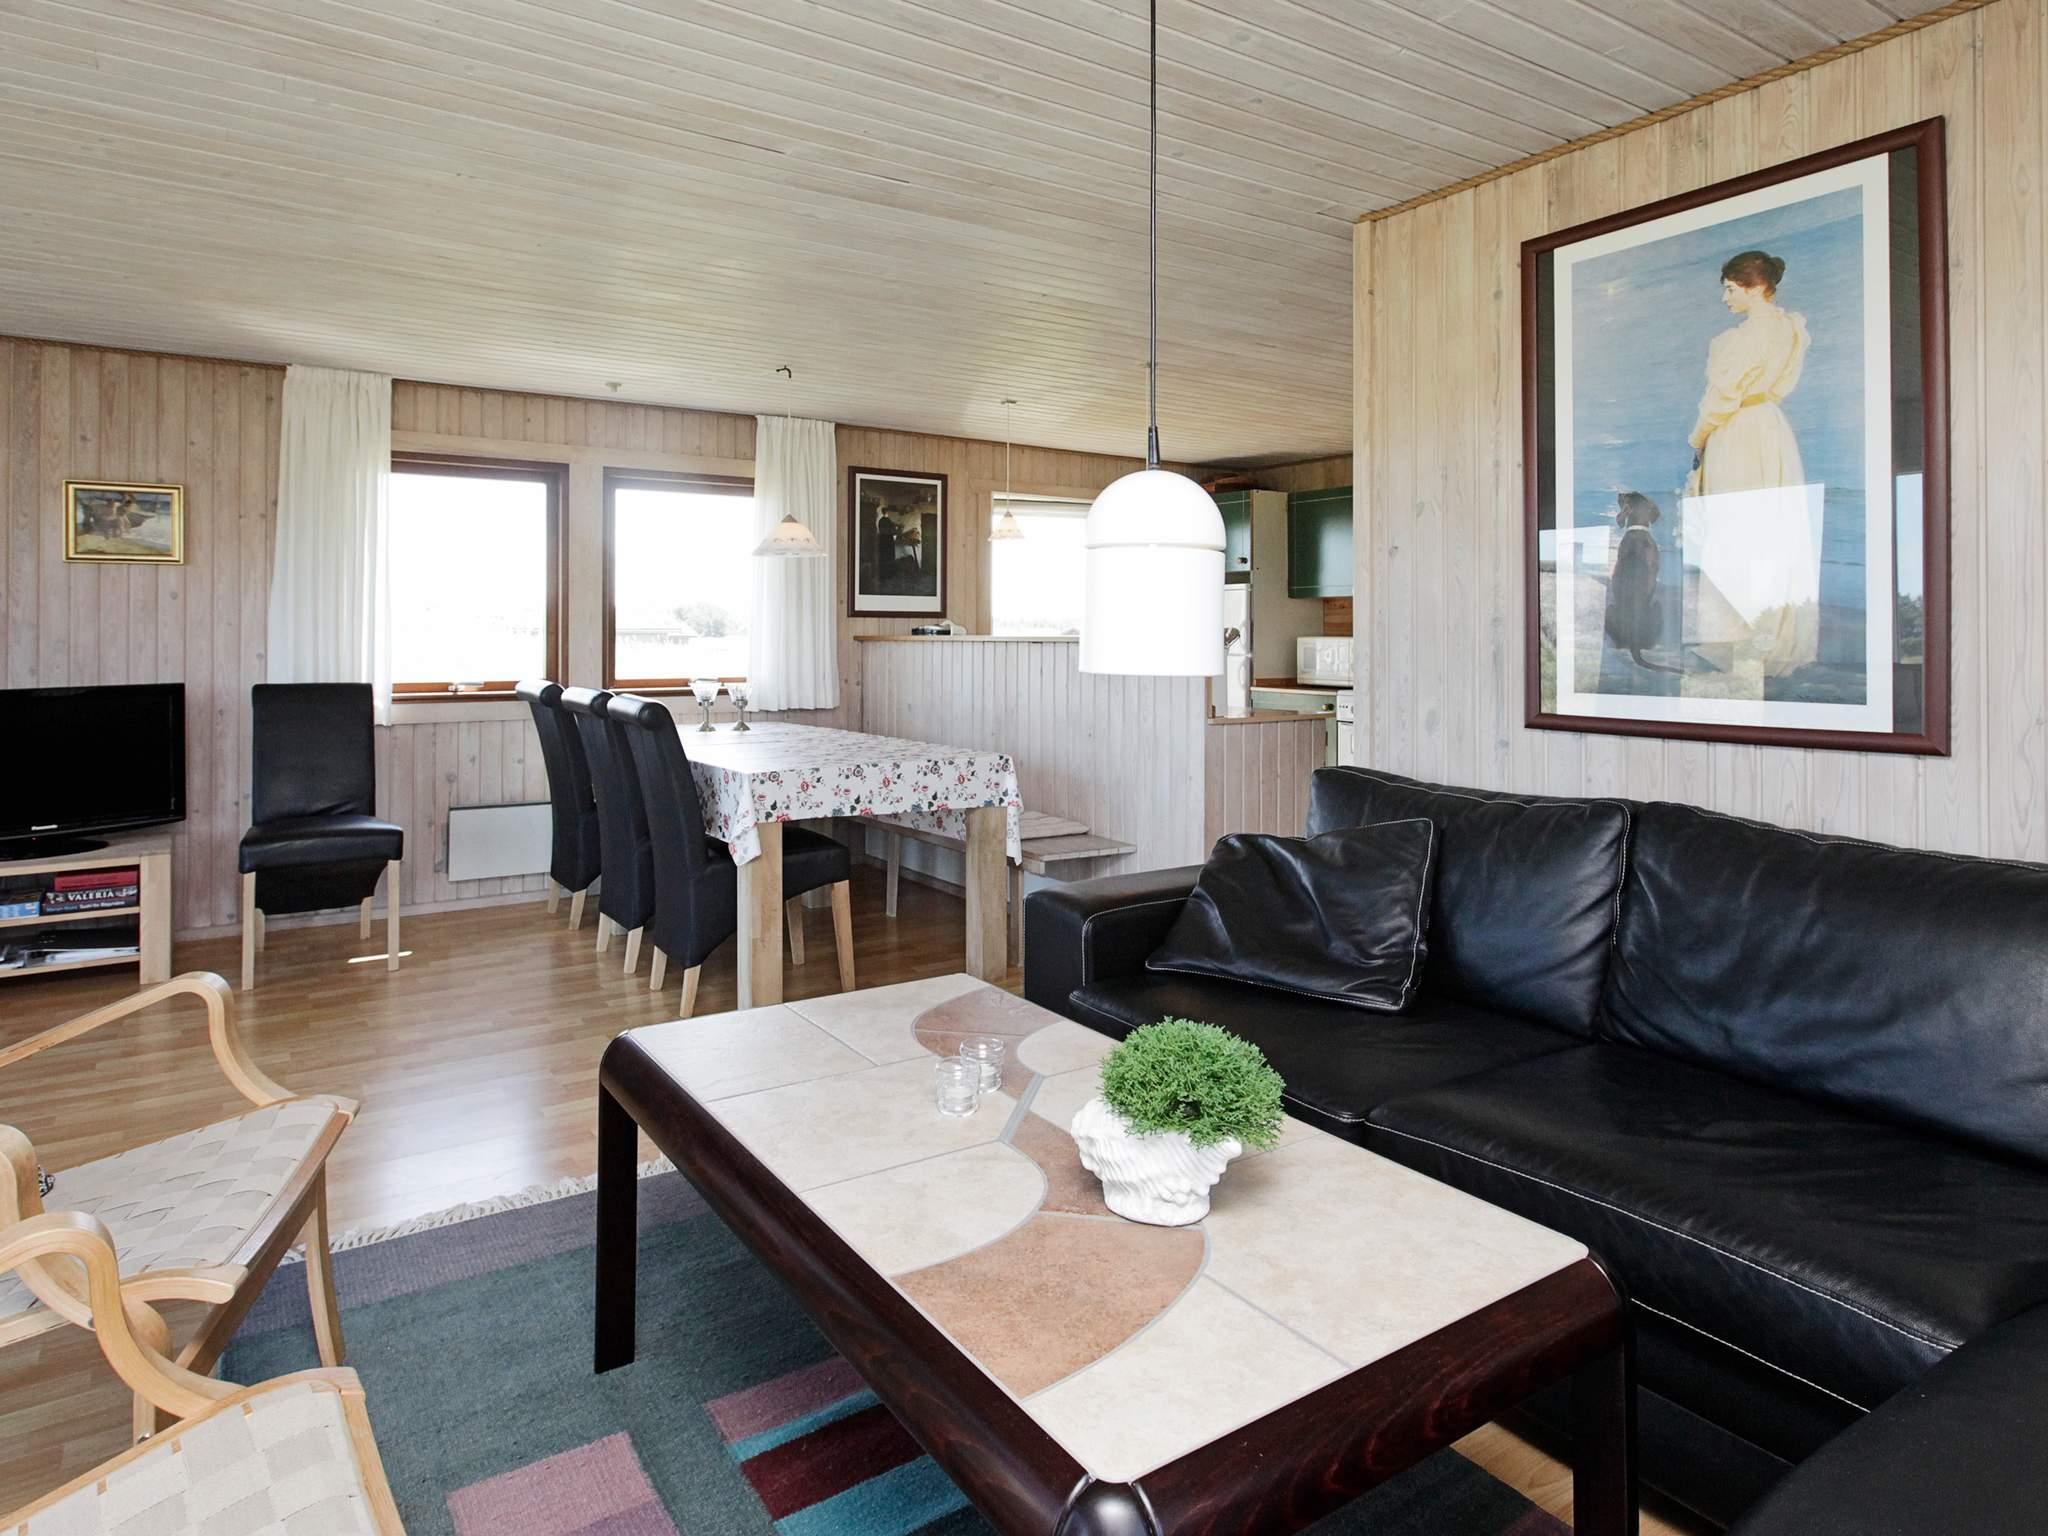 Ferienhaus Grønhøj Strand (83808), Løkken, , Nordwestjütland, Dänemark, Bild 3